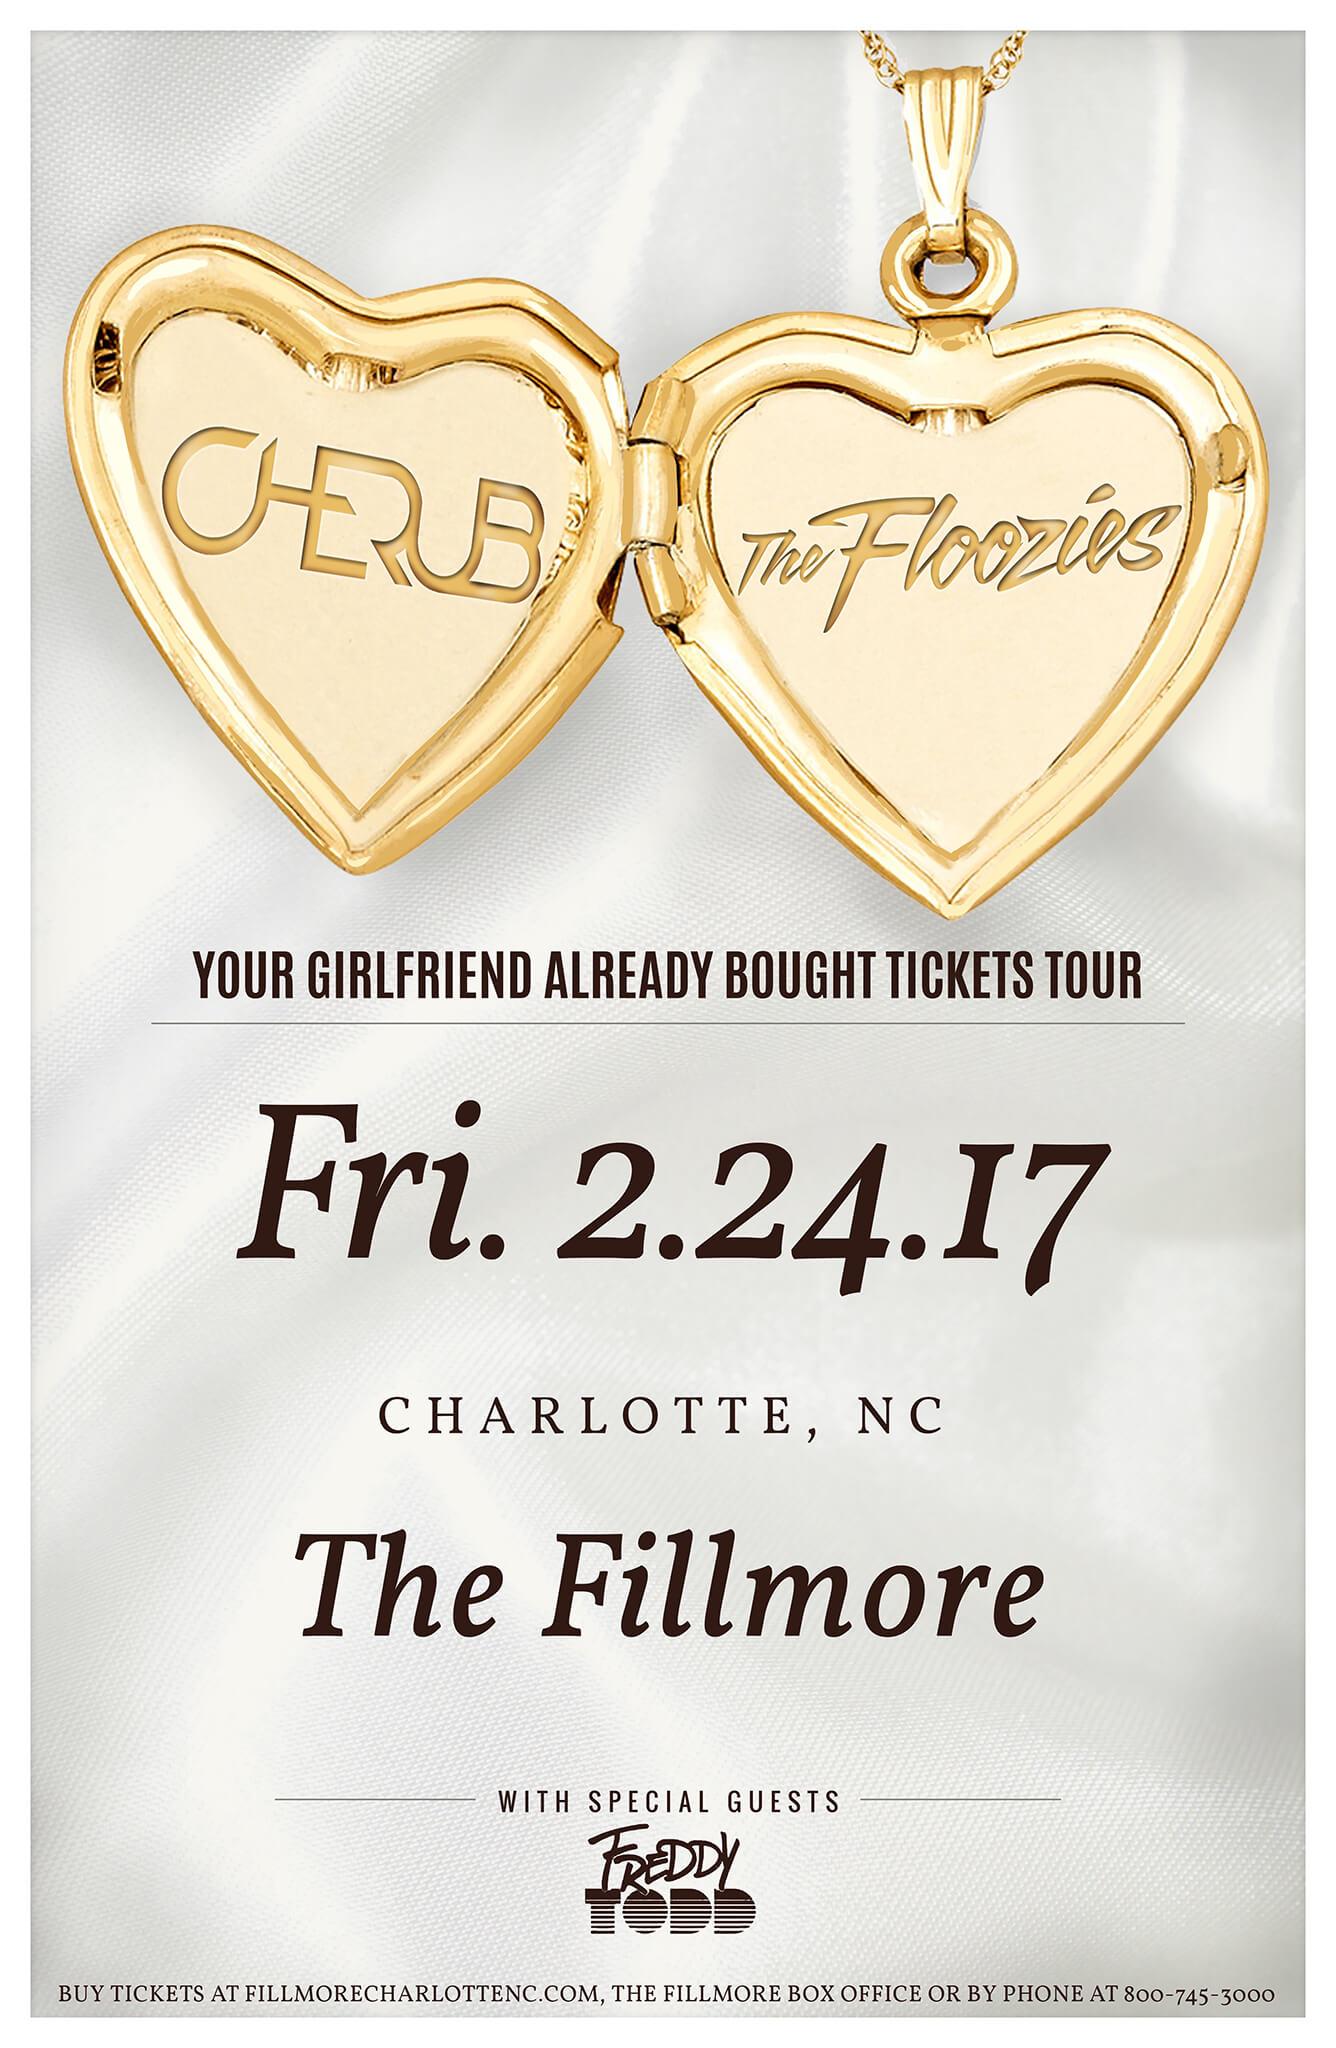 Cherub, The Floozies, Freddy Todd in Charlotte